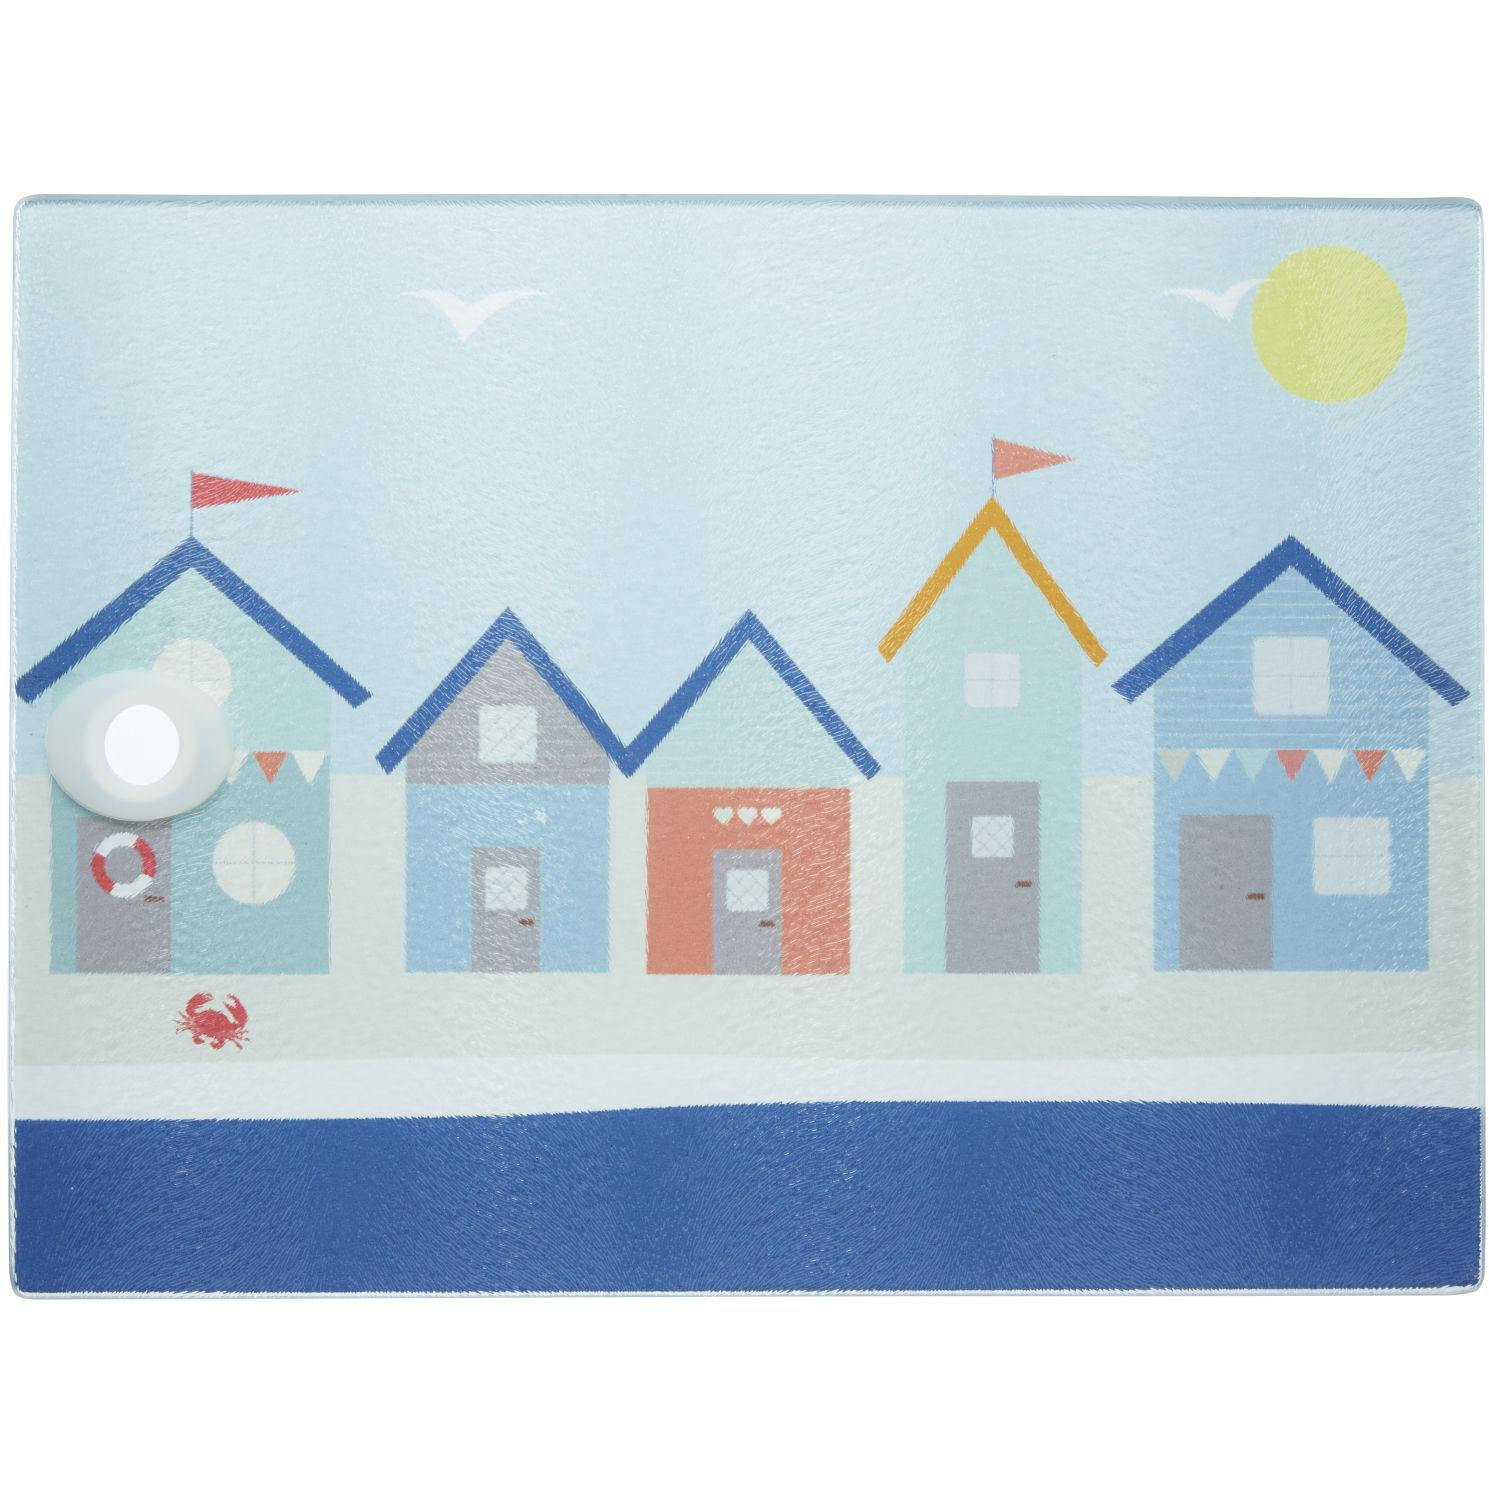 KitchenCraft Coastal\' Toughened Glass Worktop Saver, 40 x 30 cm (16 ...